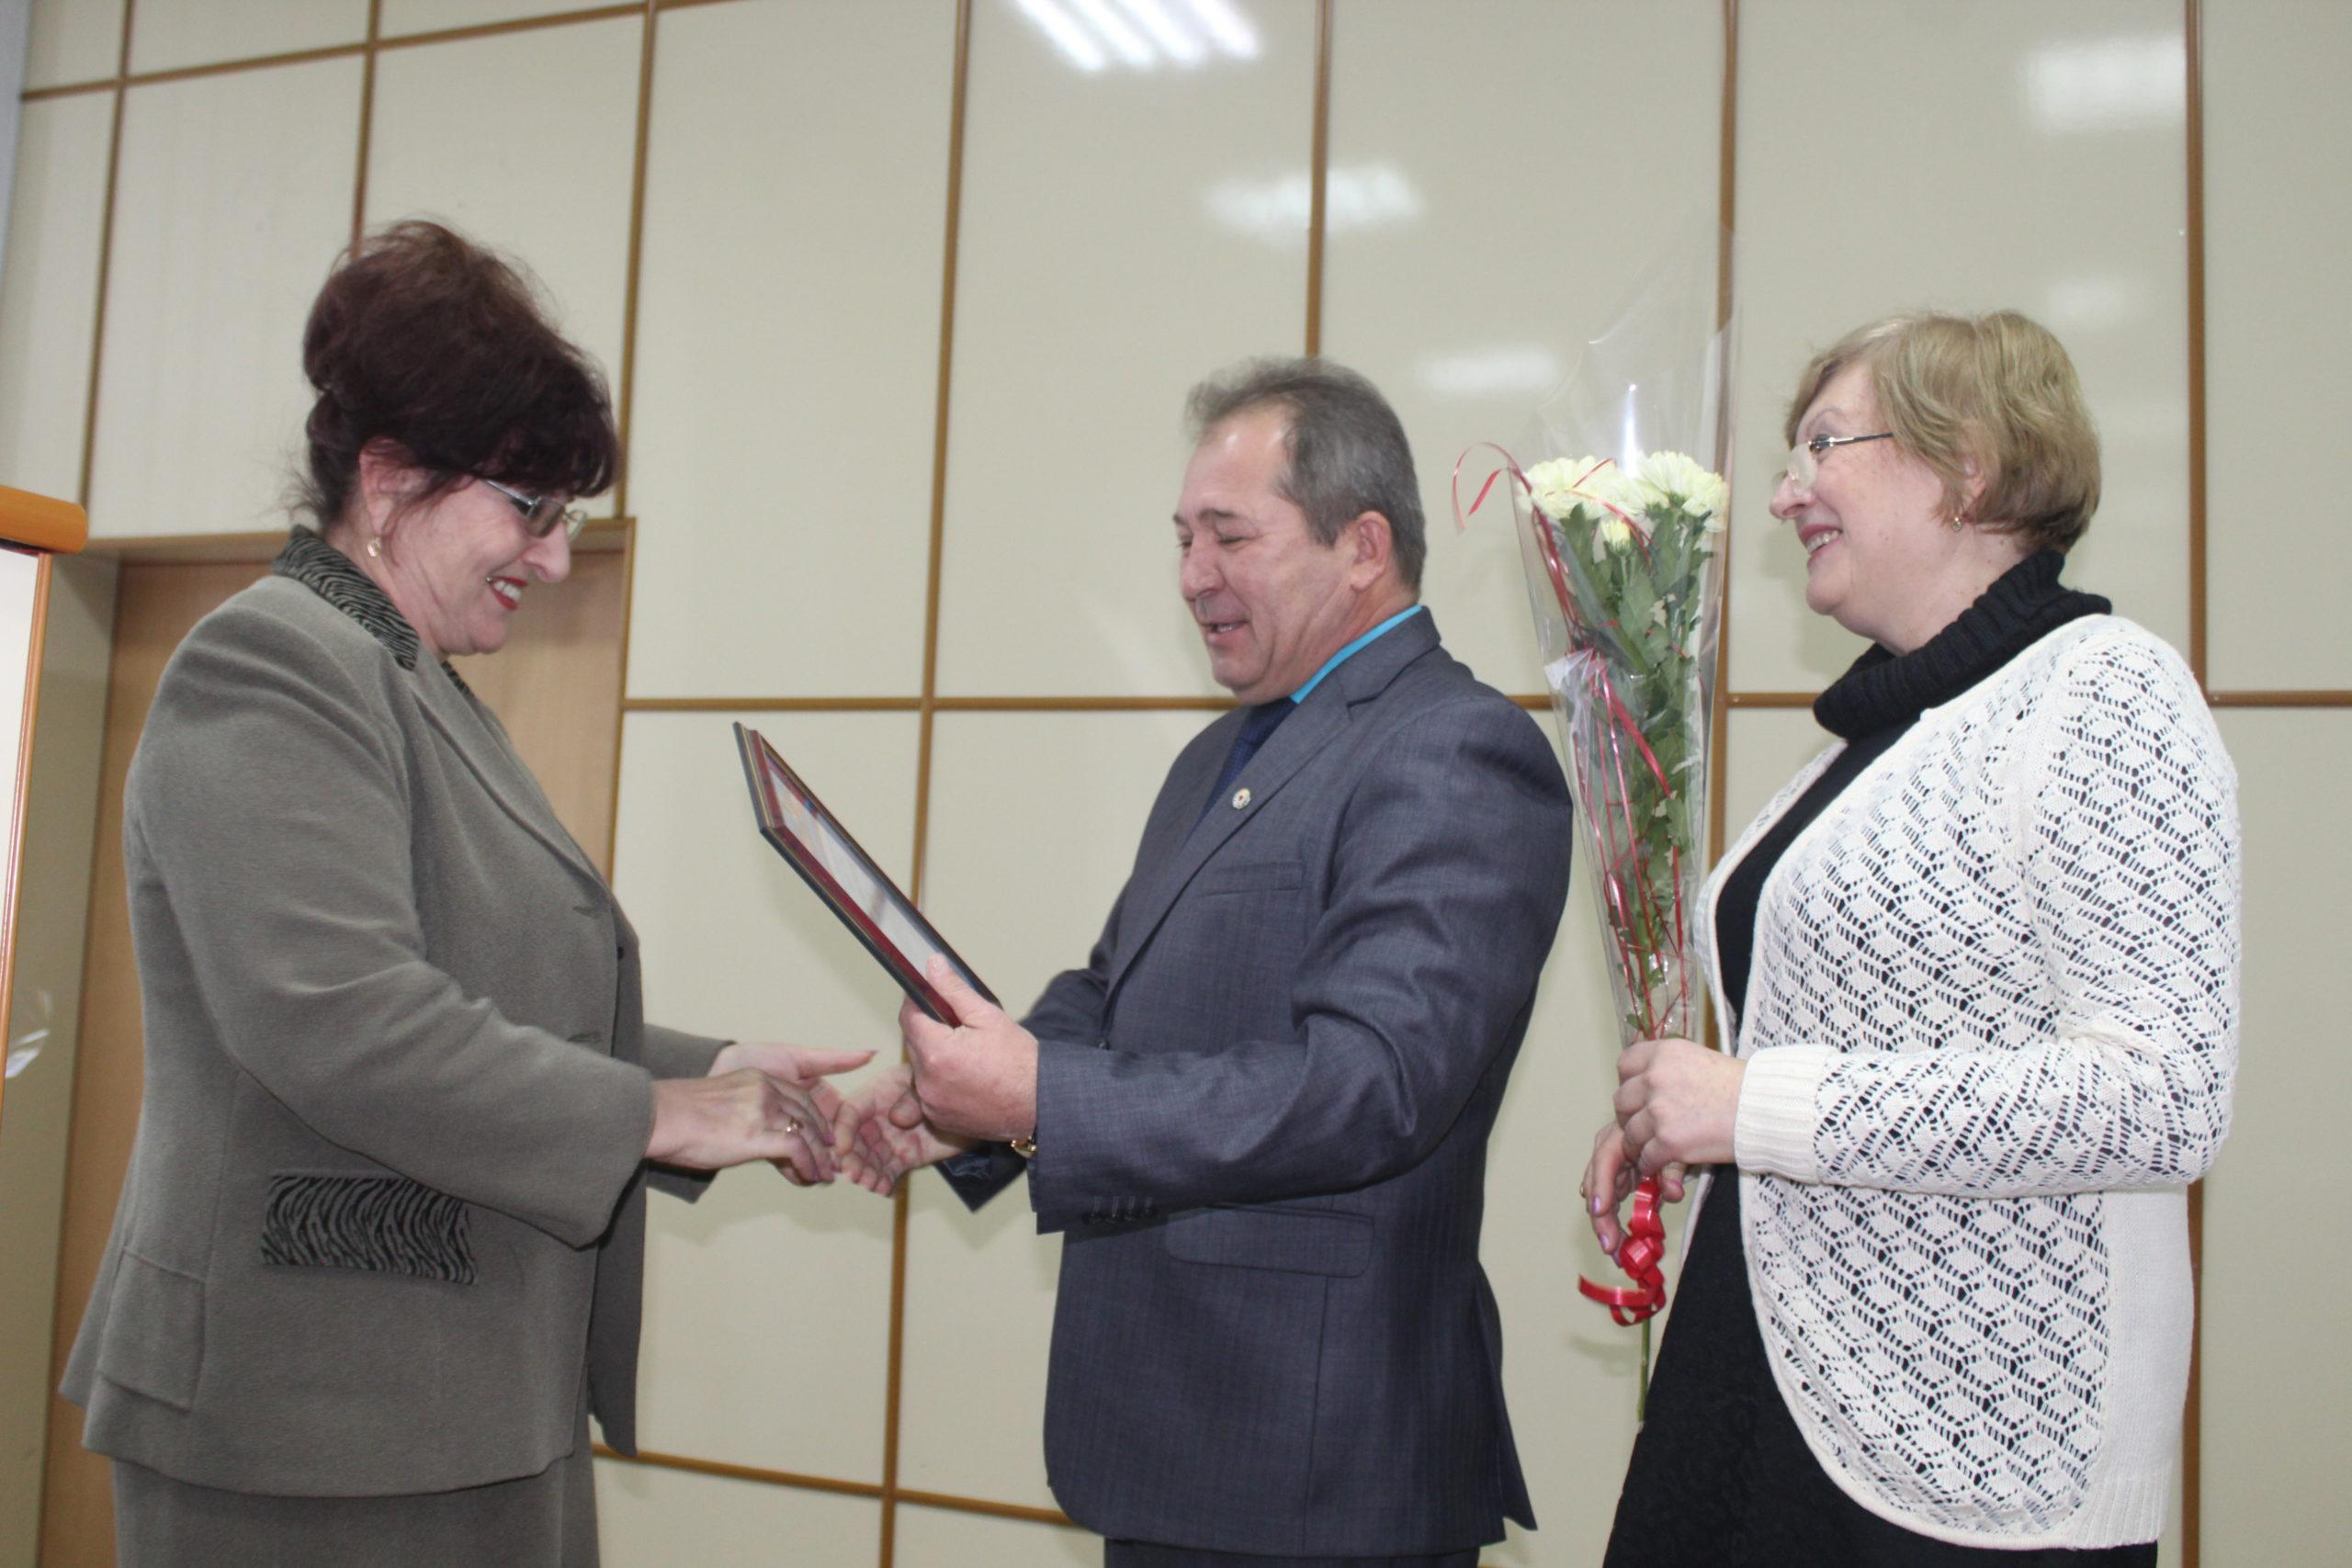 В Славяносербске состоялся пленум Славяносербской организации ветеранов 1